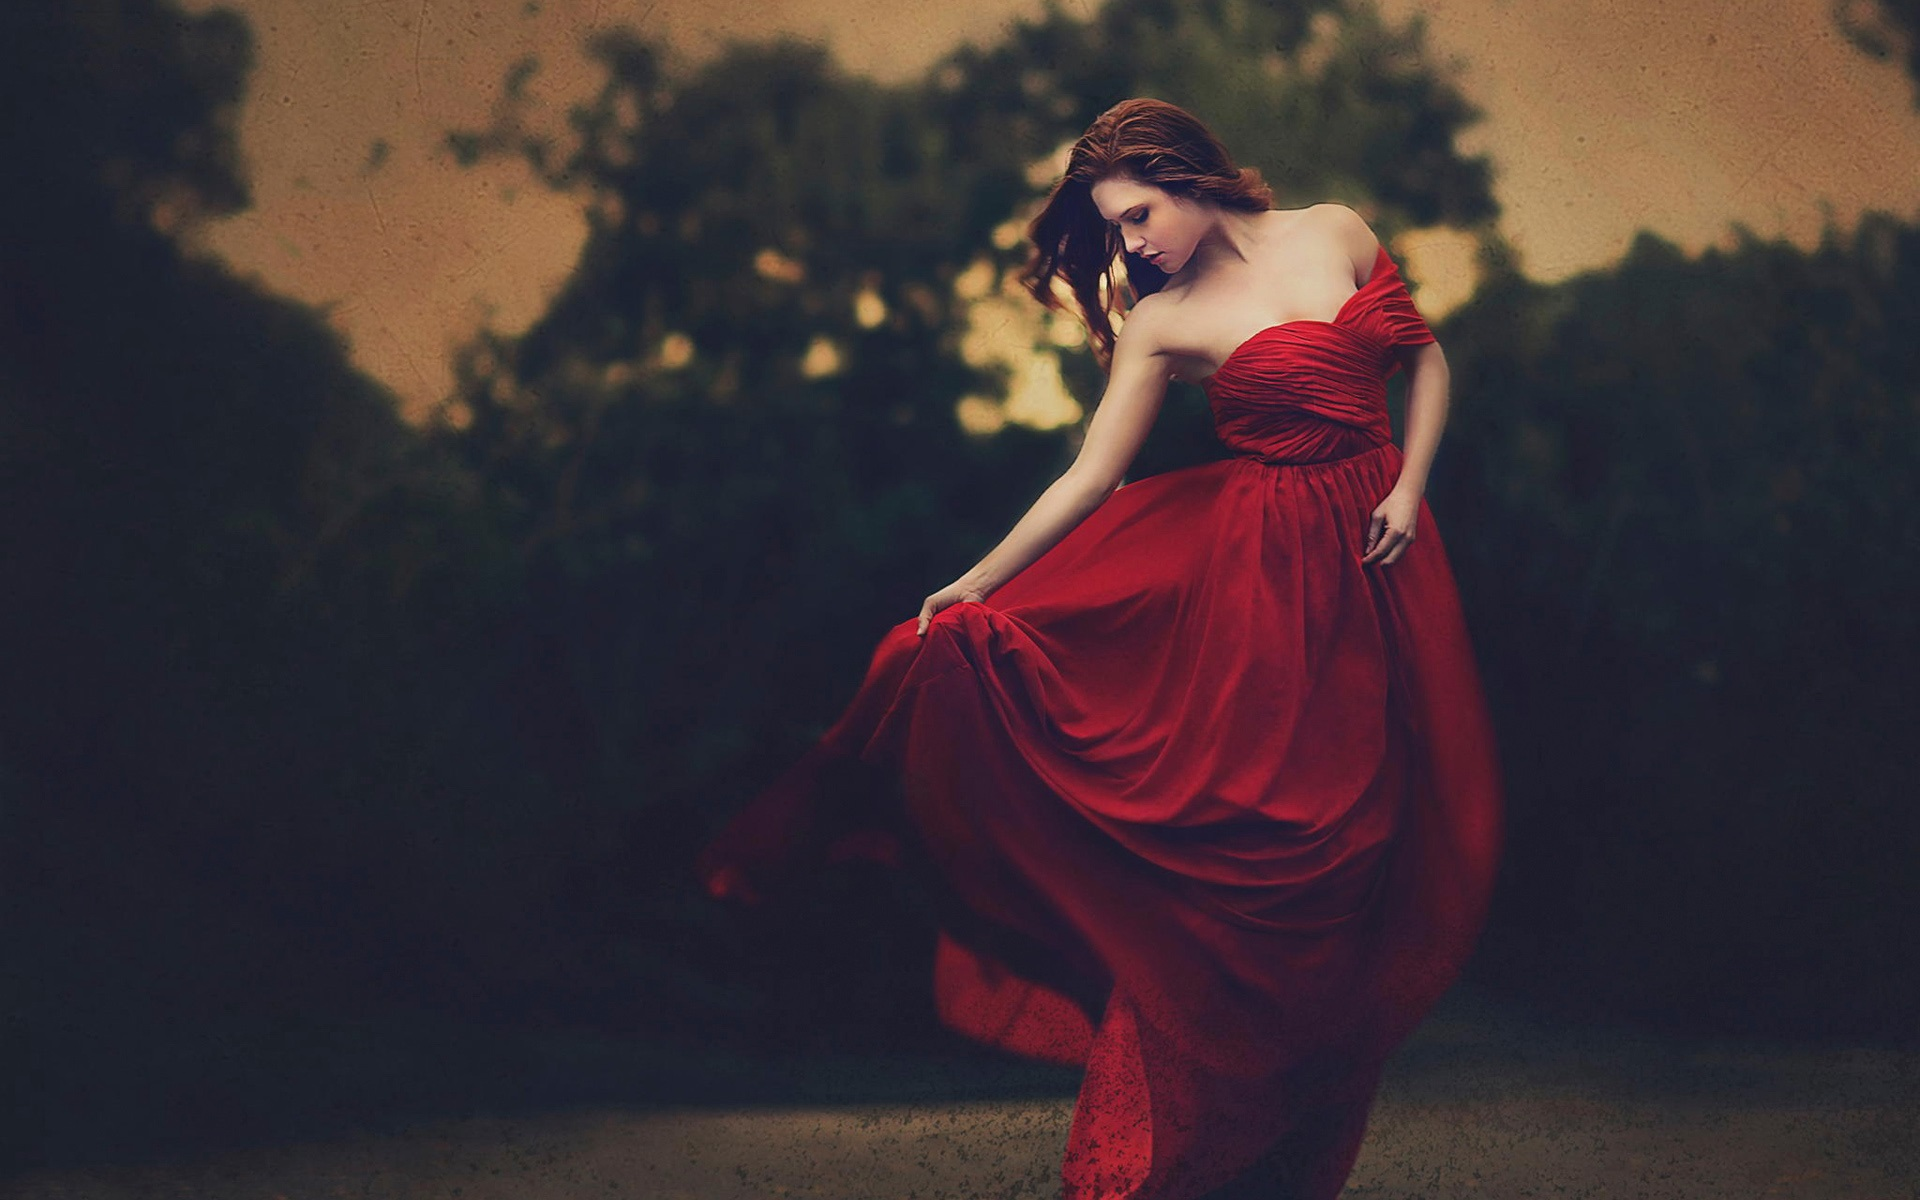 Fondos De Pantalla Hermosa Chica De Vestido Rojo Anochecer